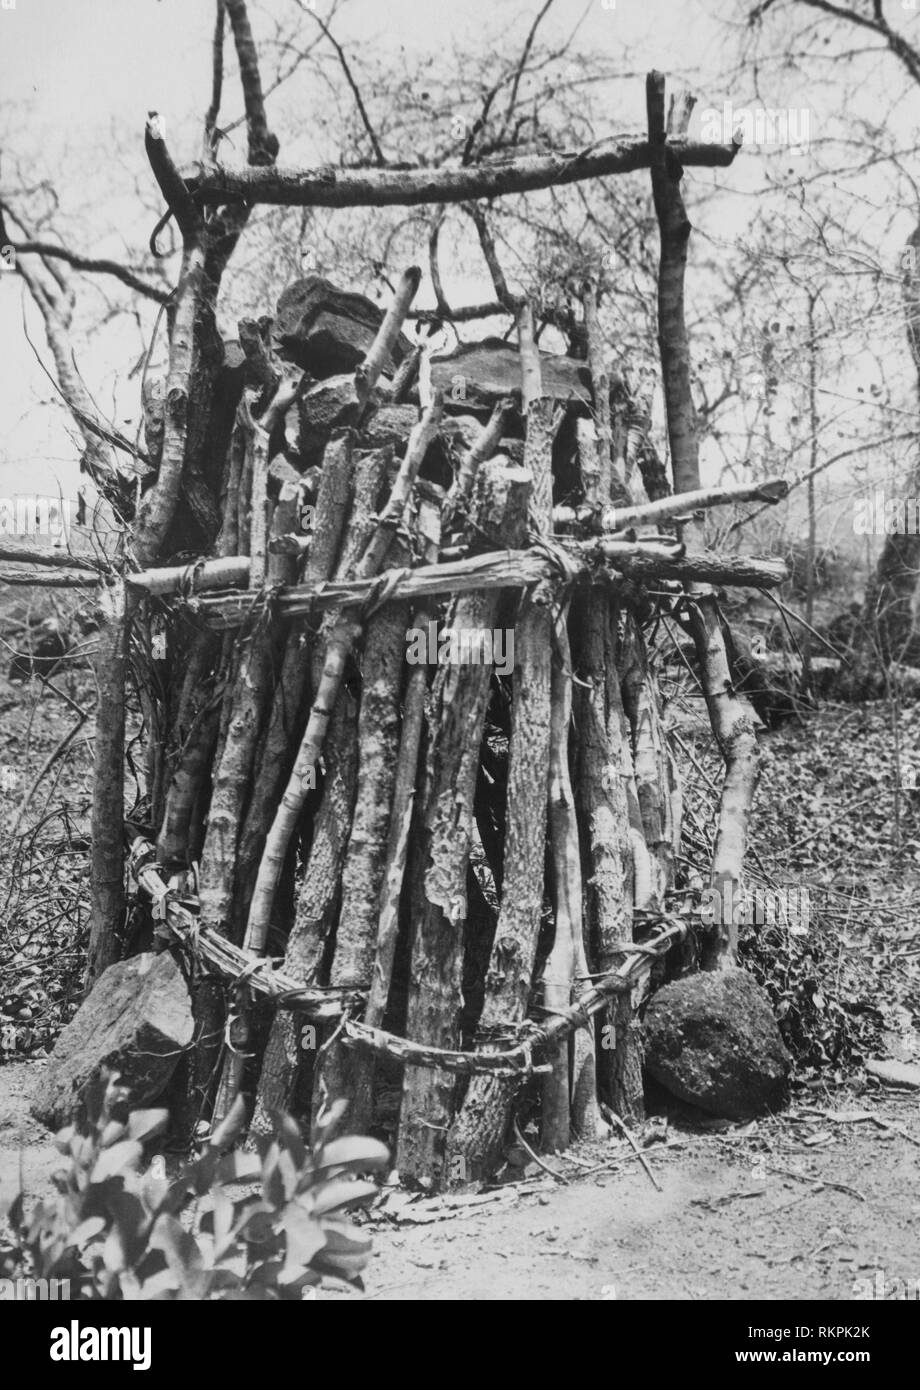 monkey trap, rhodesia, africa 1920 1930 - Stock Image